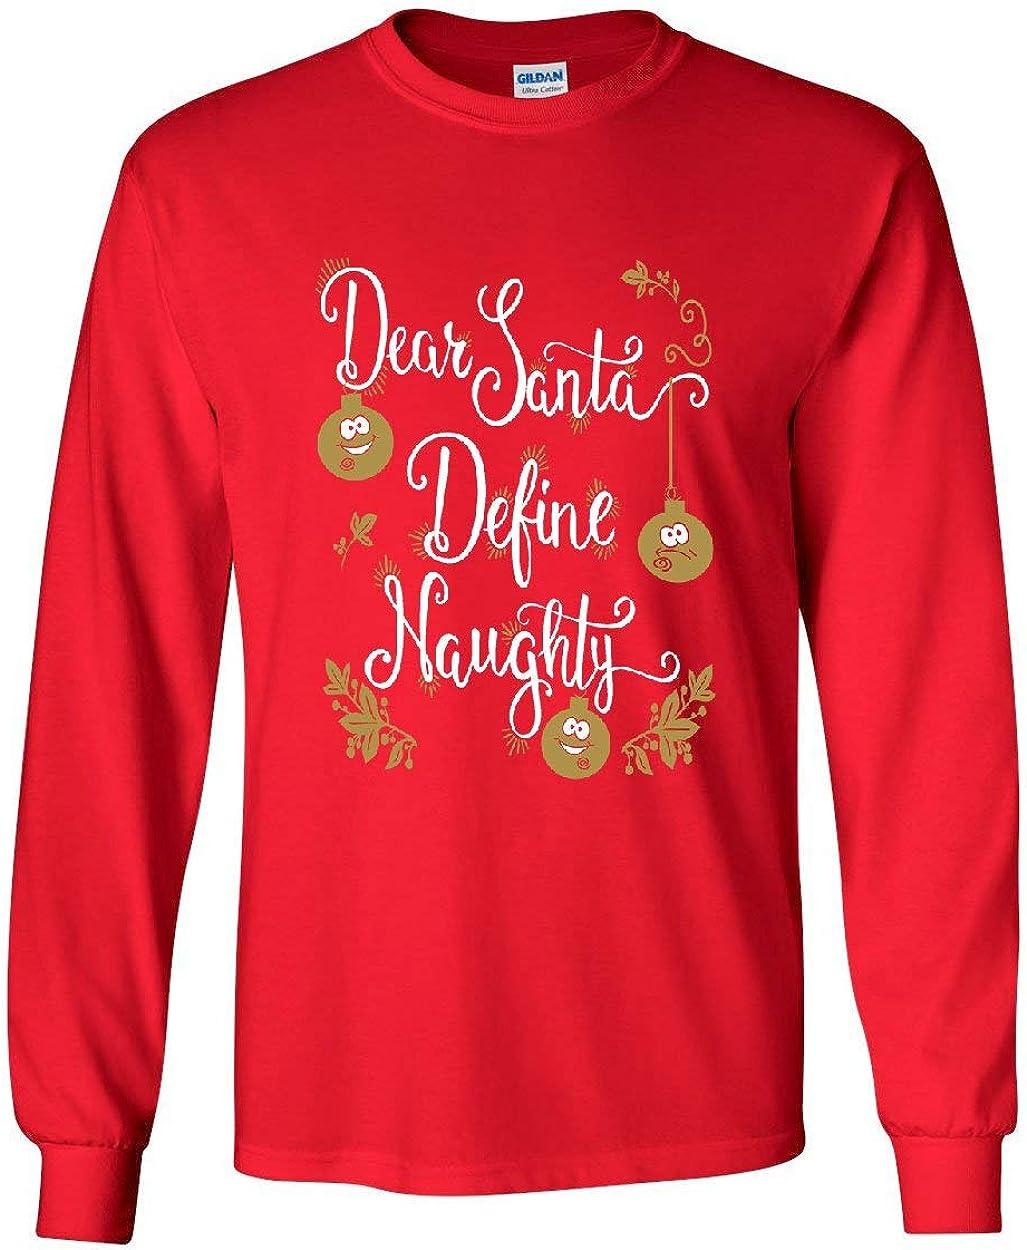 Dear Santa Please Define Naughty Red Adult Long Sleeve T-Shirt Top